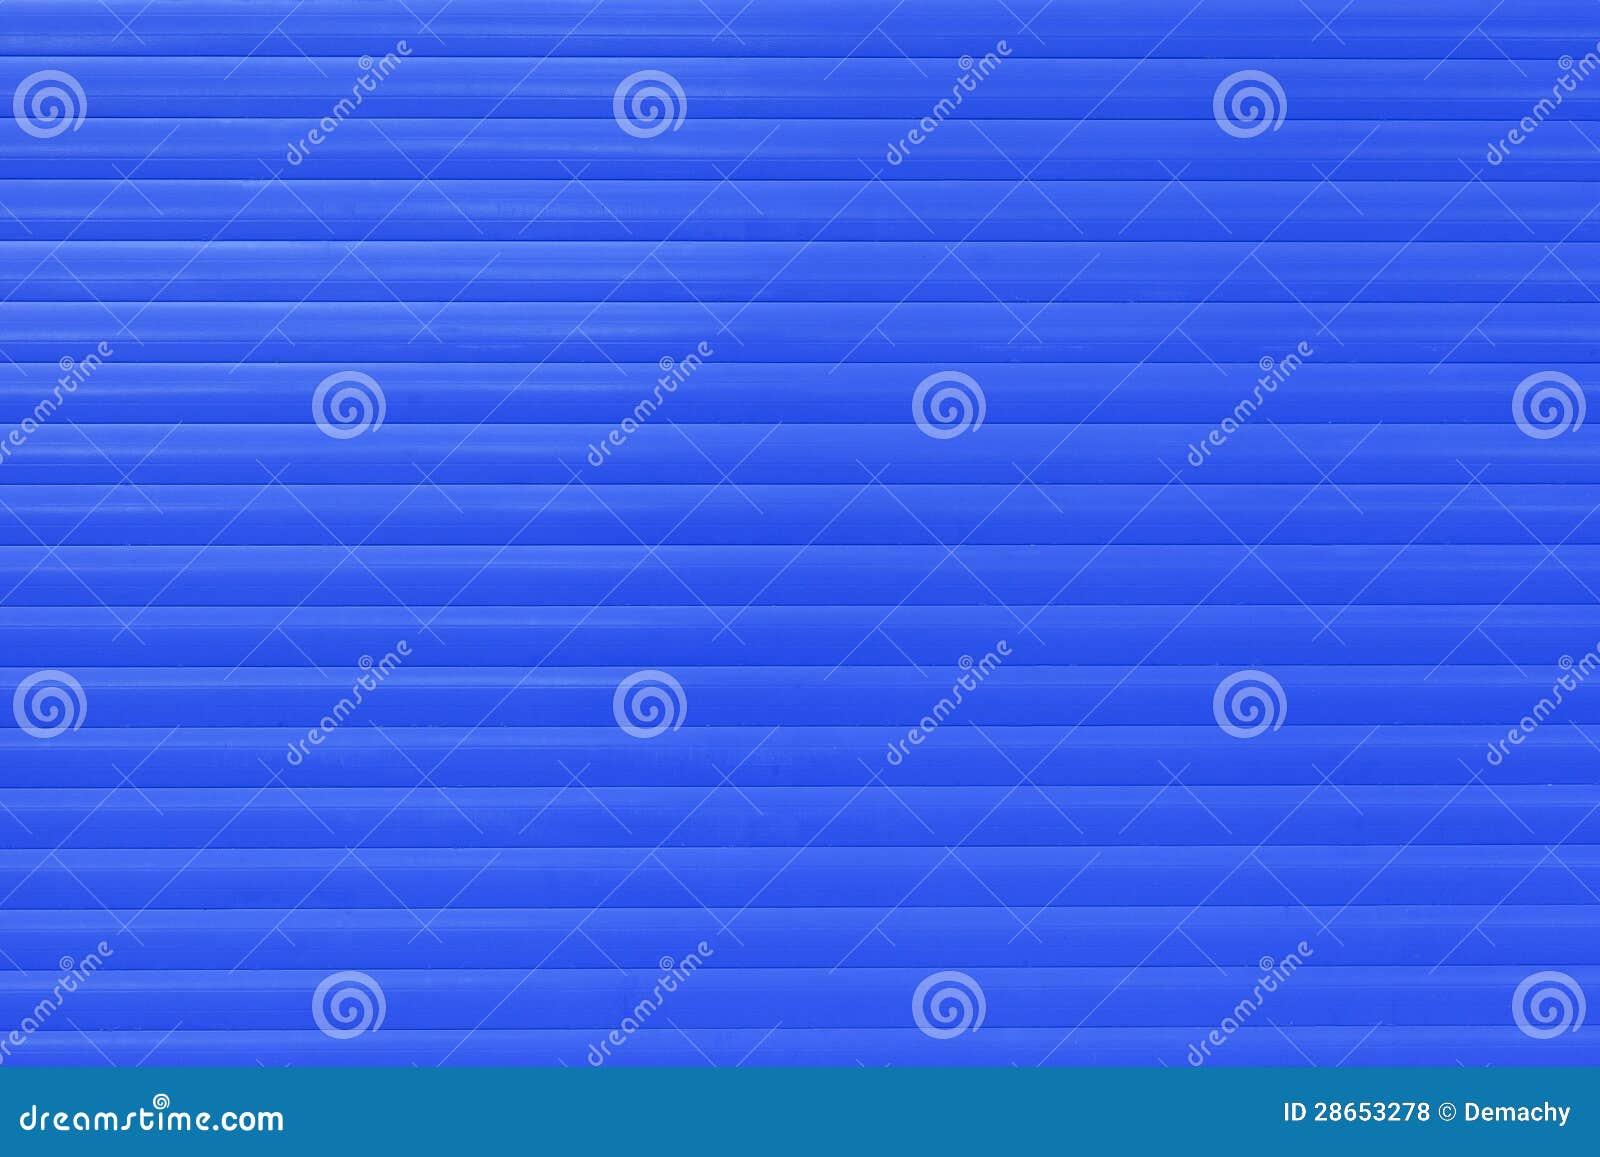 Blue window blinds royalty free stock photos image 28653278